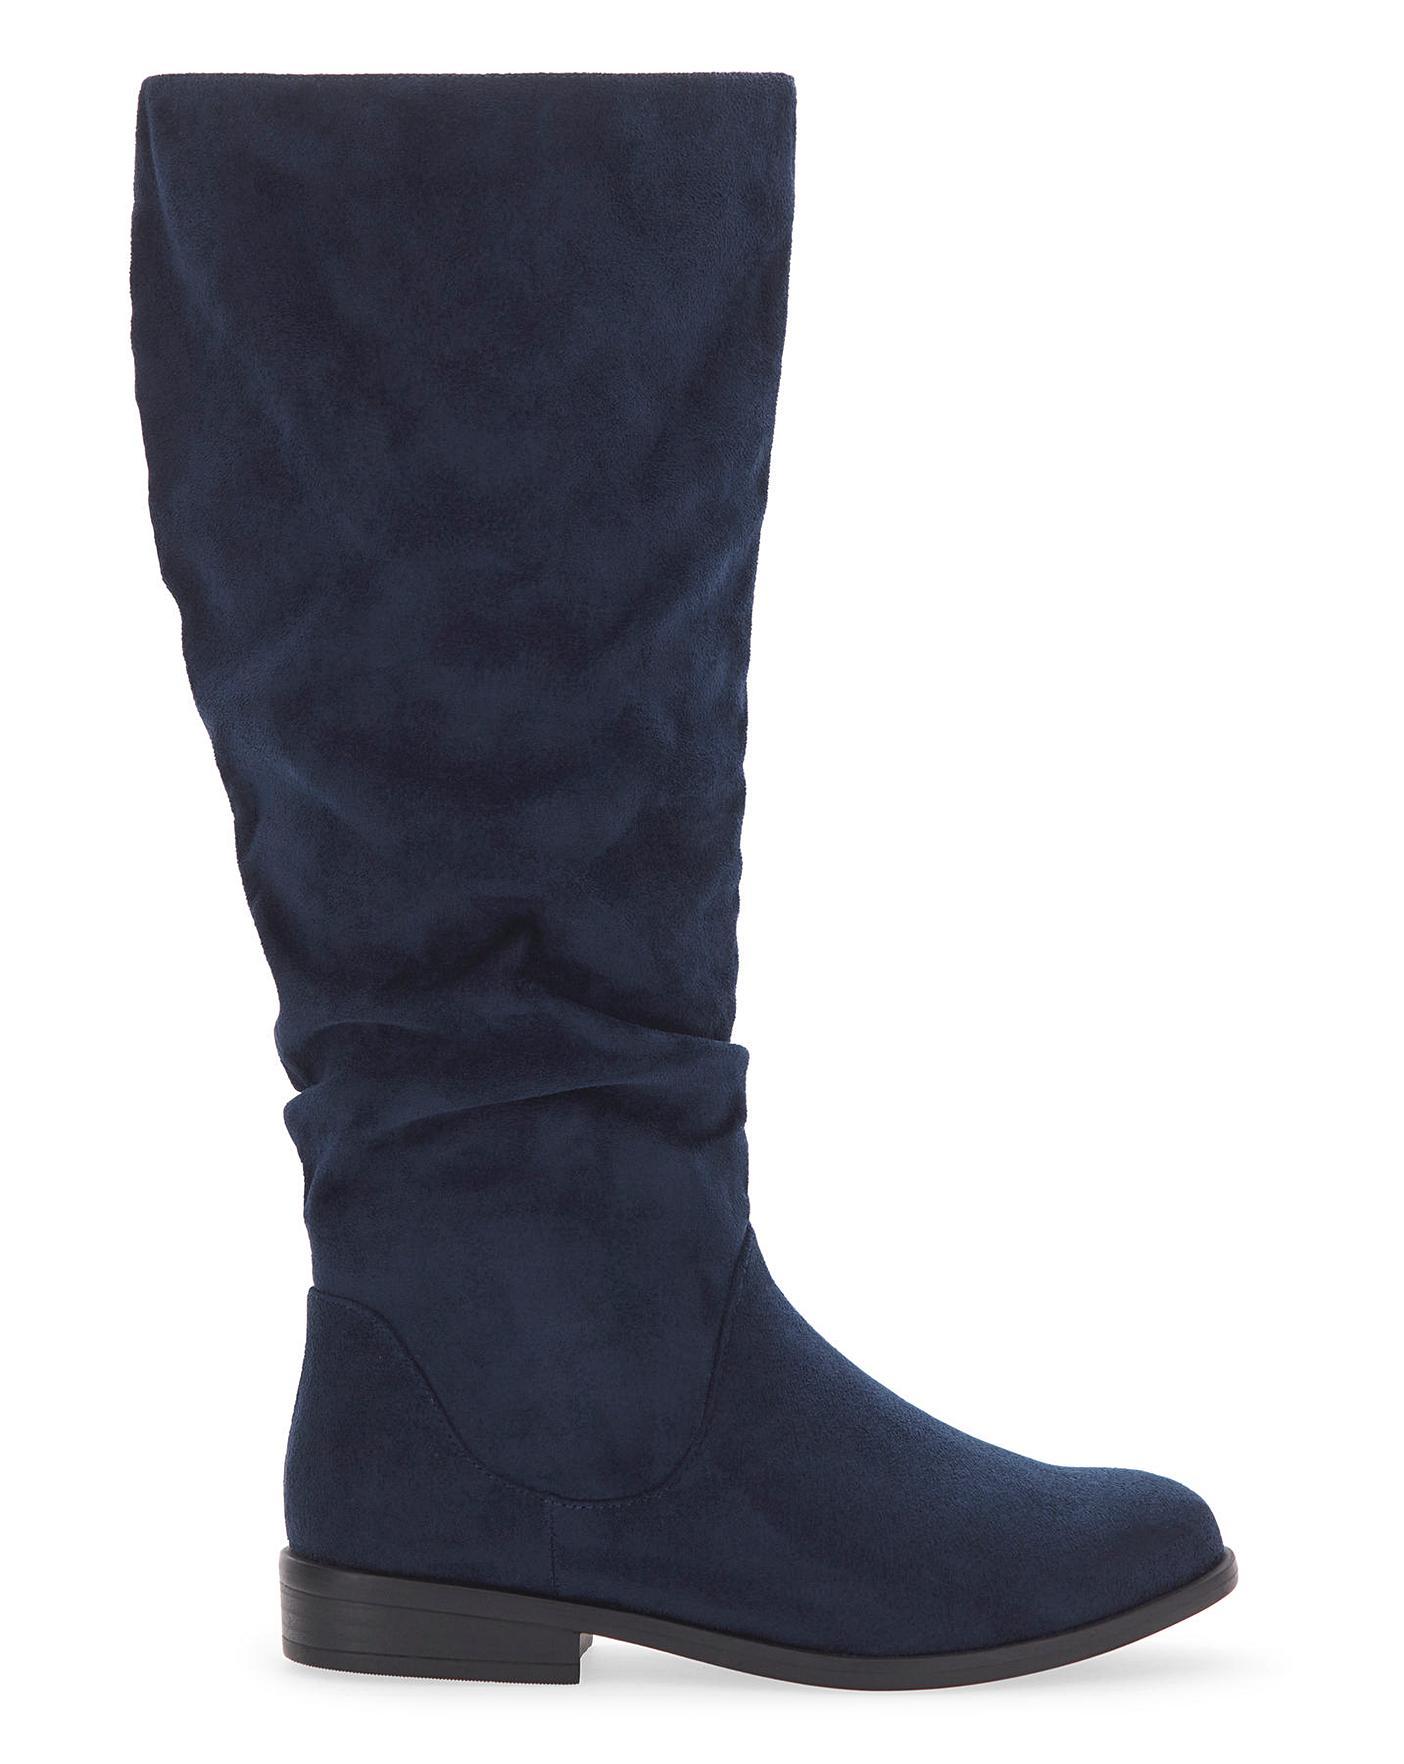 Microsuede Boots EEE Fit Standard Calf